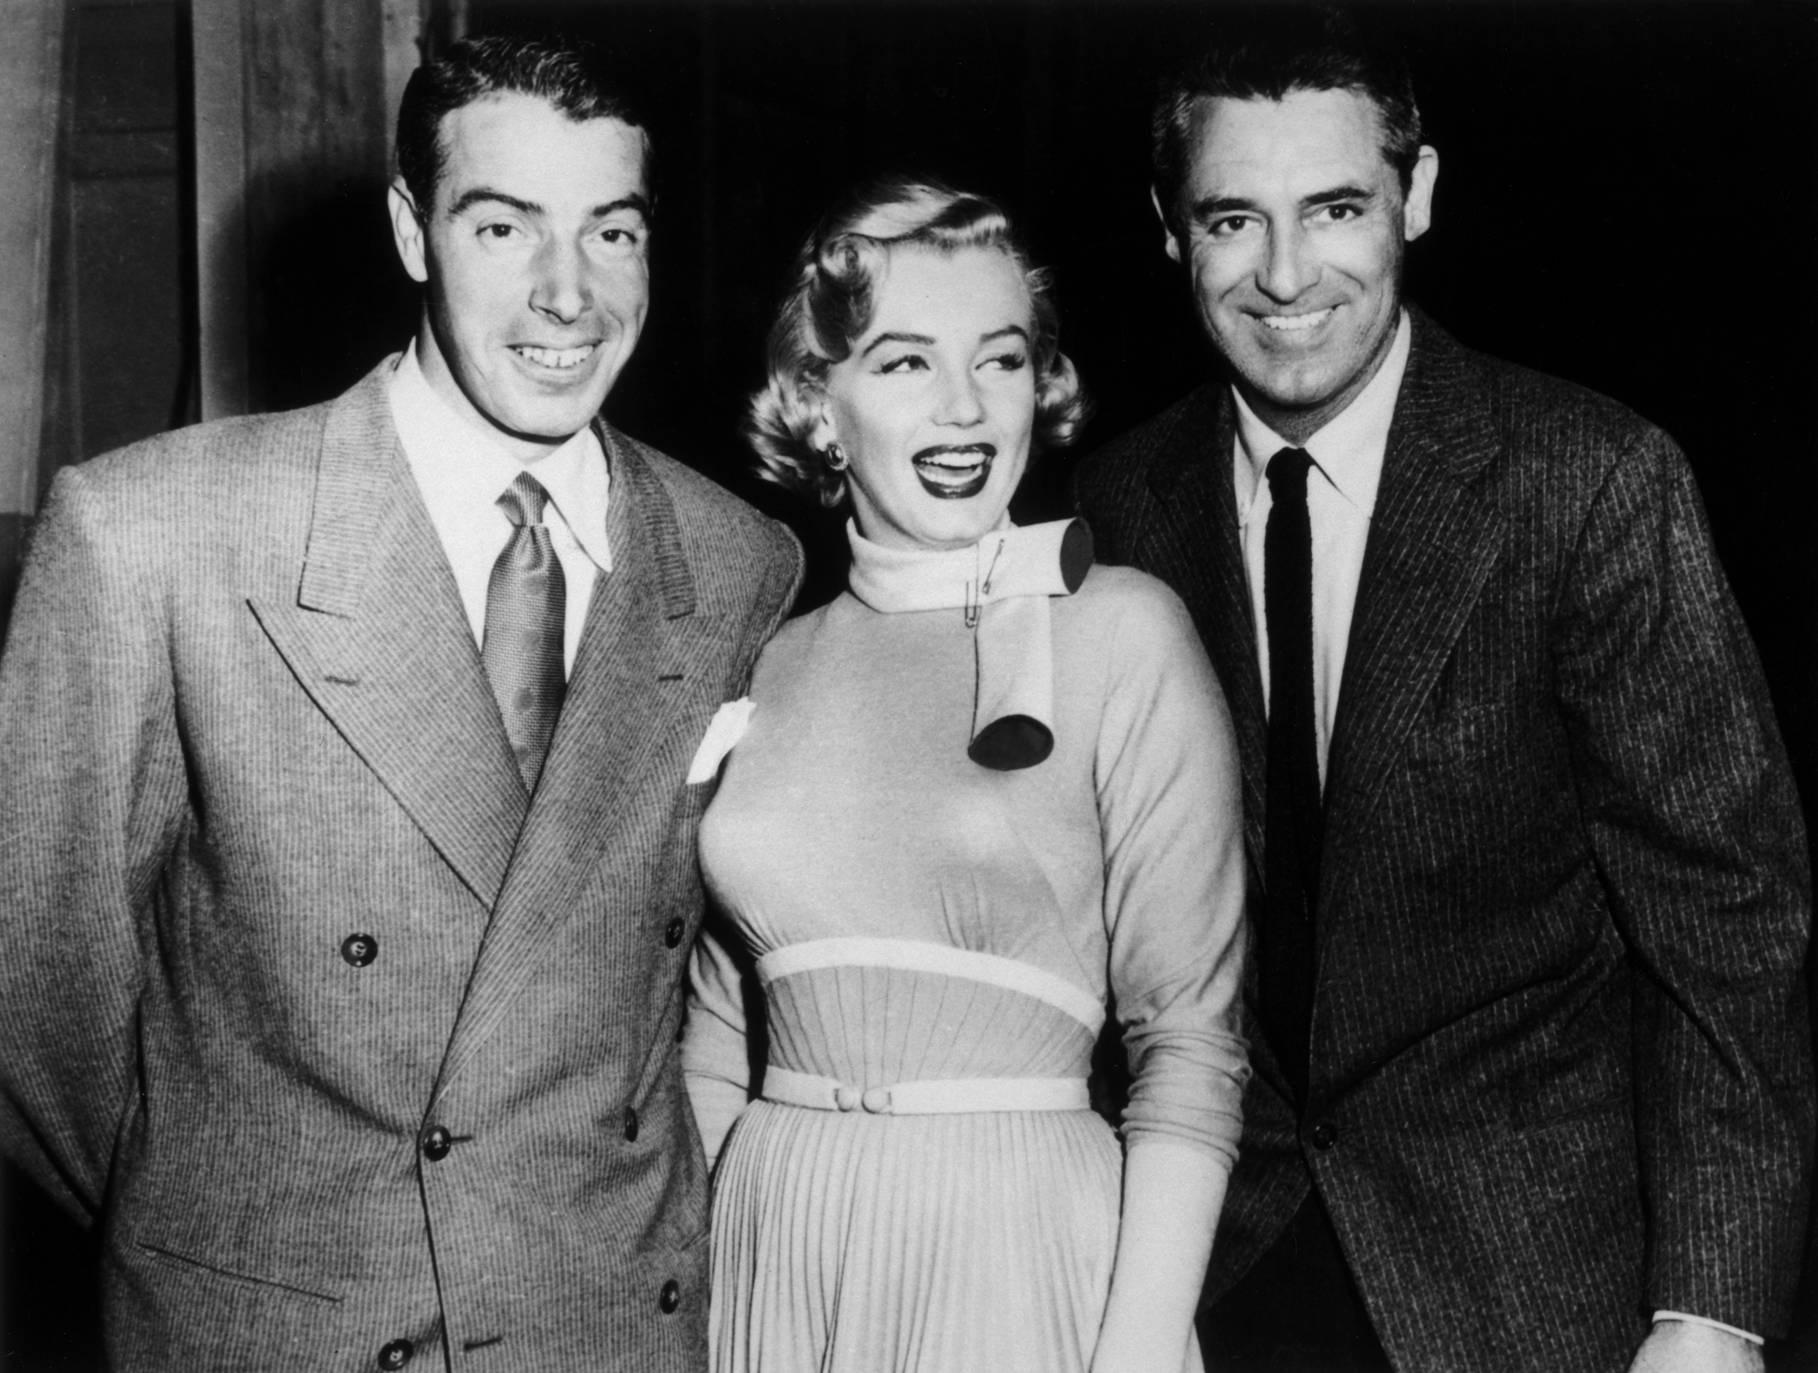 (L to R) Joe DiMaggio, Marilyn Monroe, Cary Grant